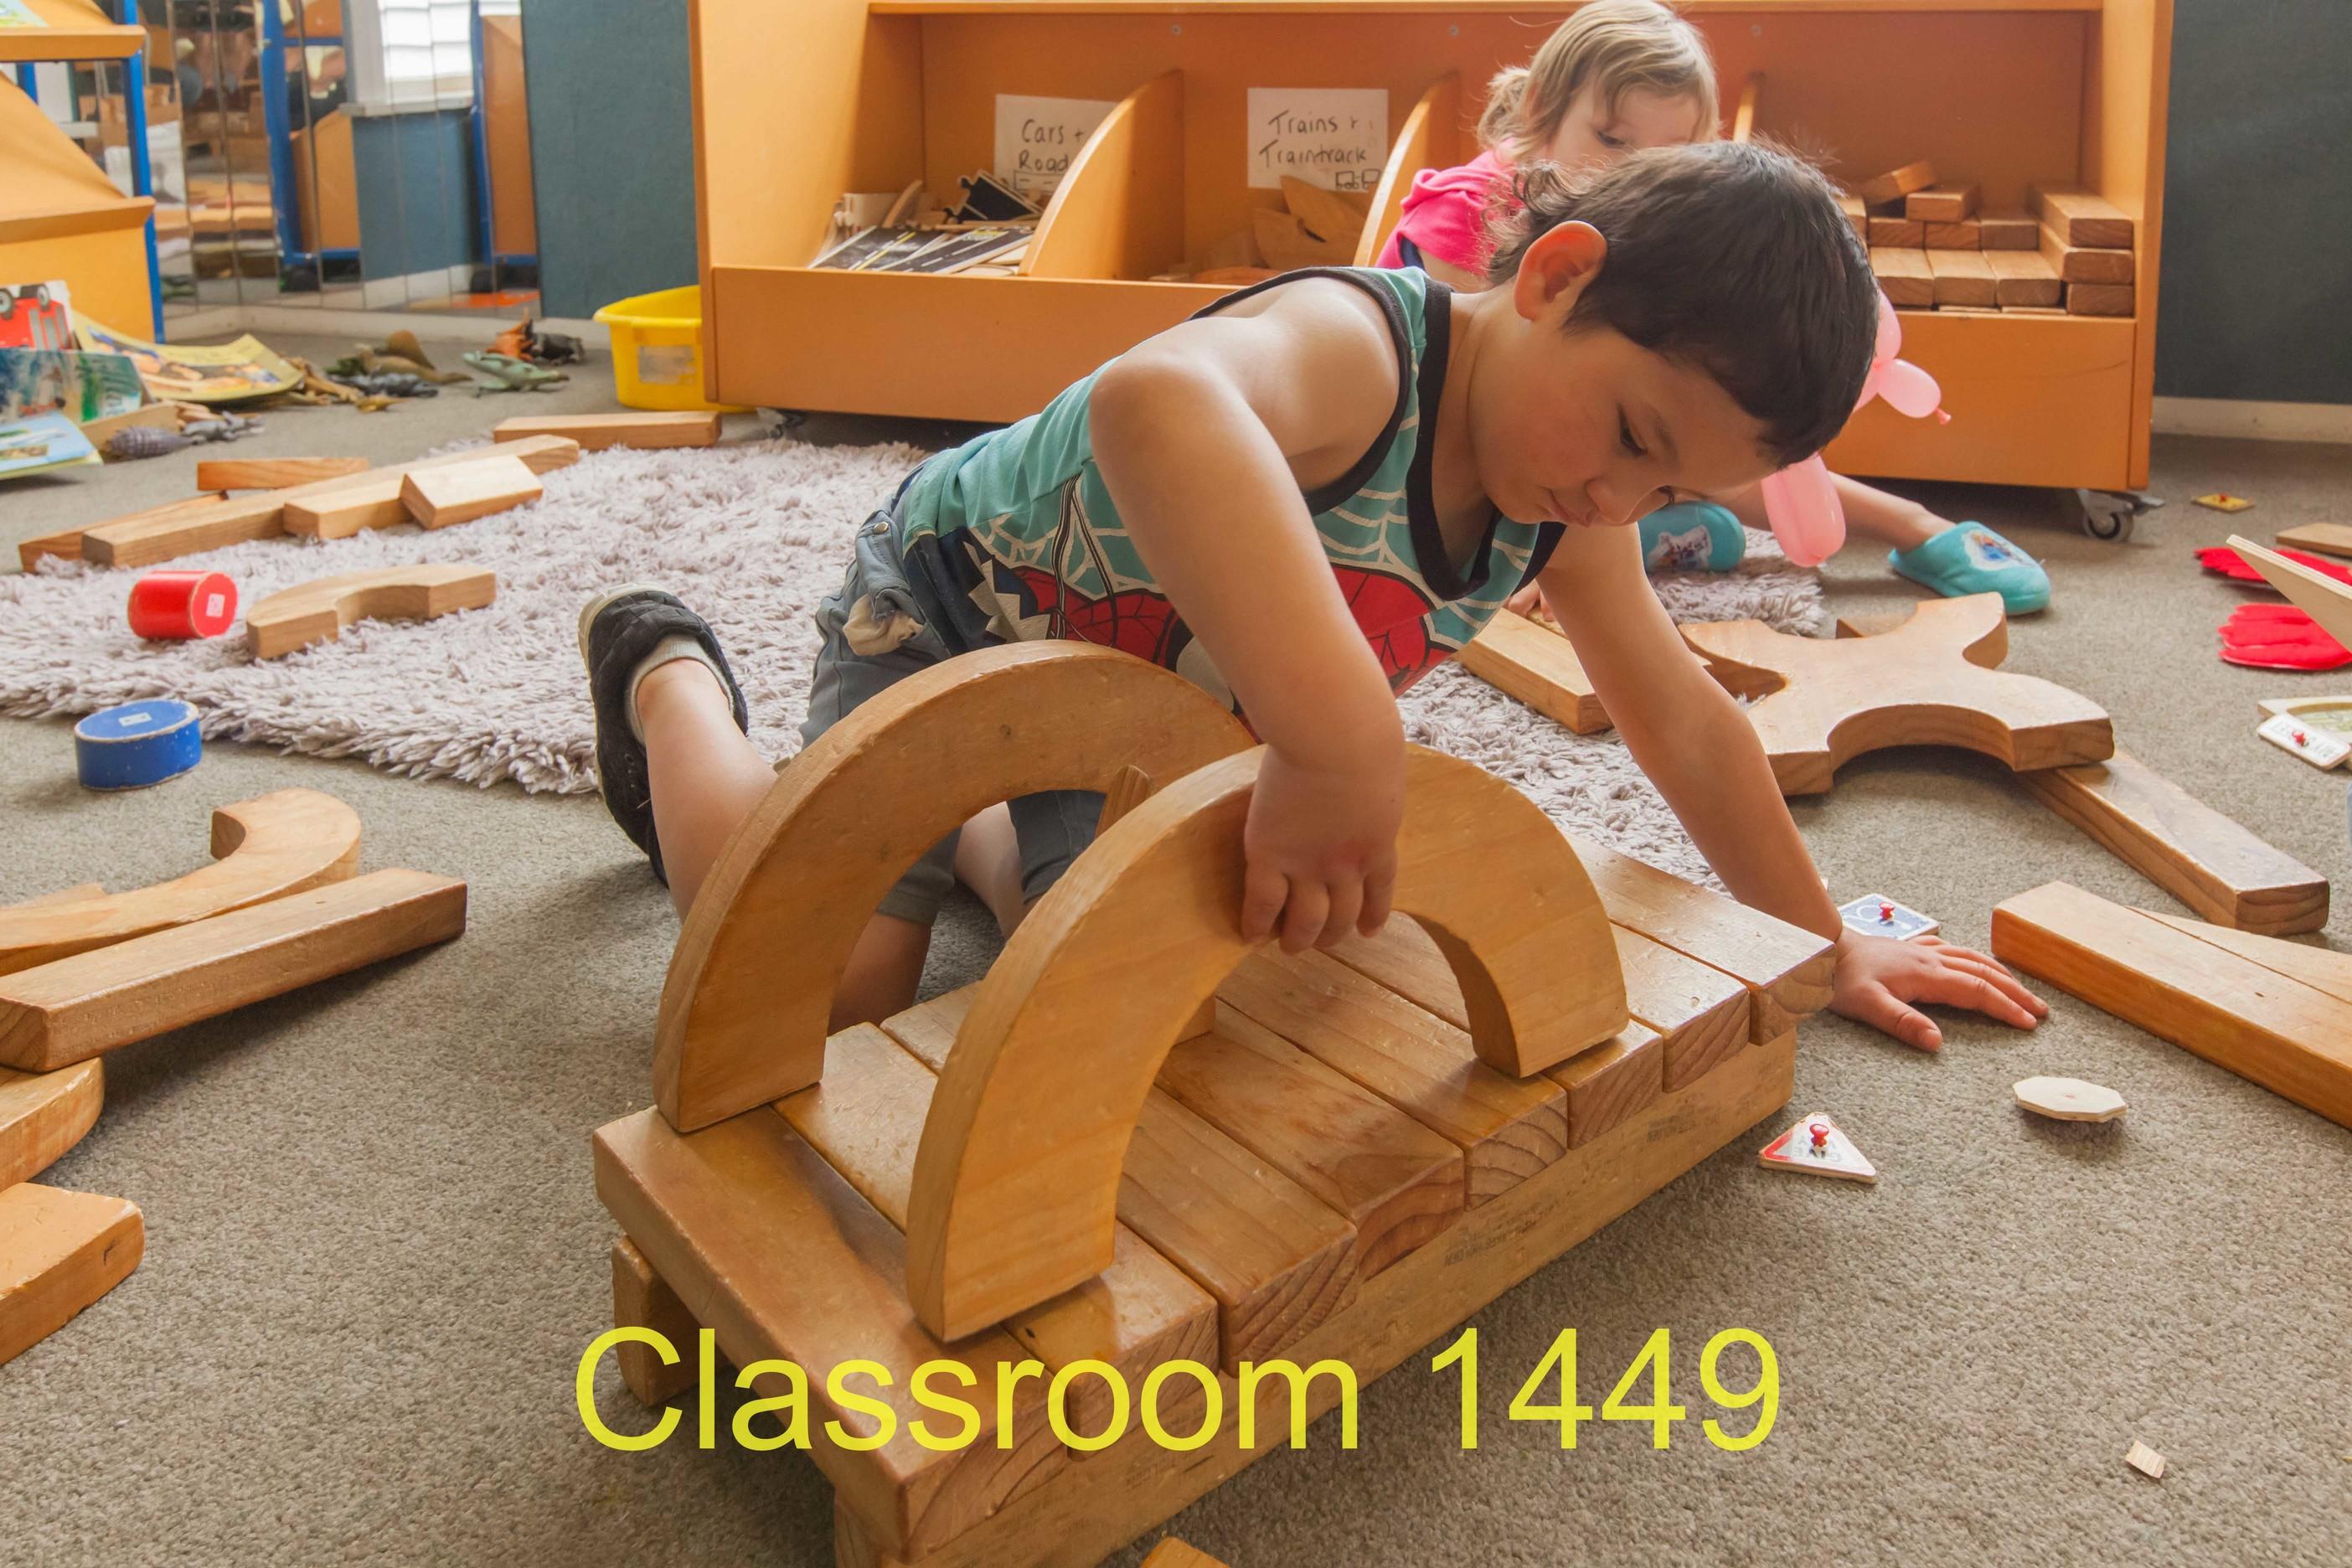 Classroom 1449